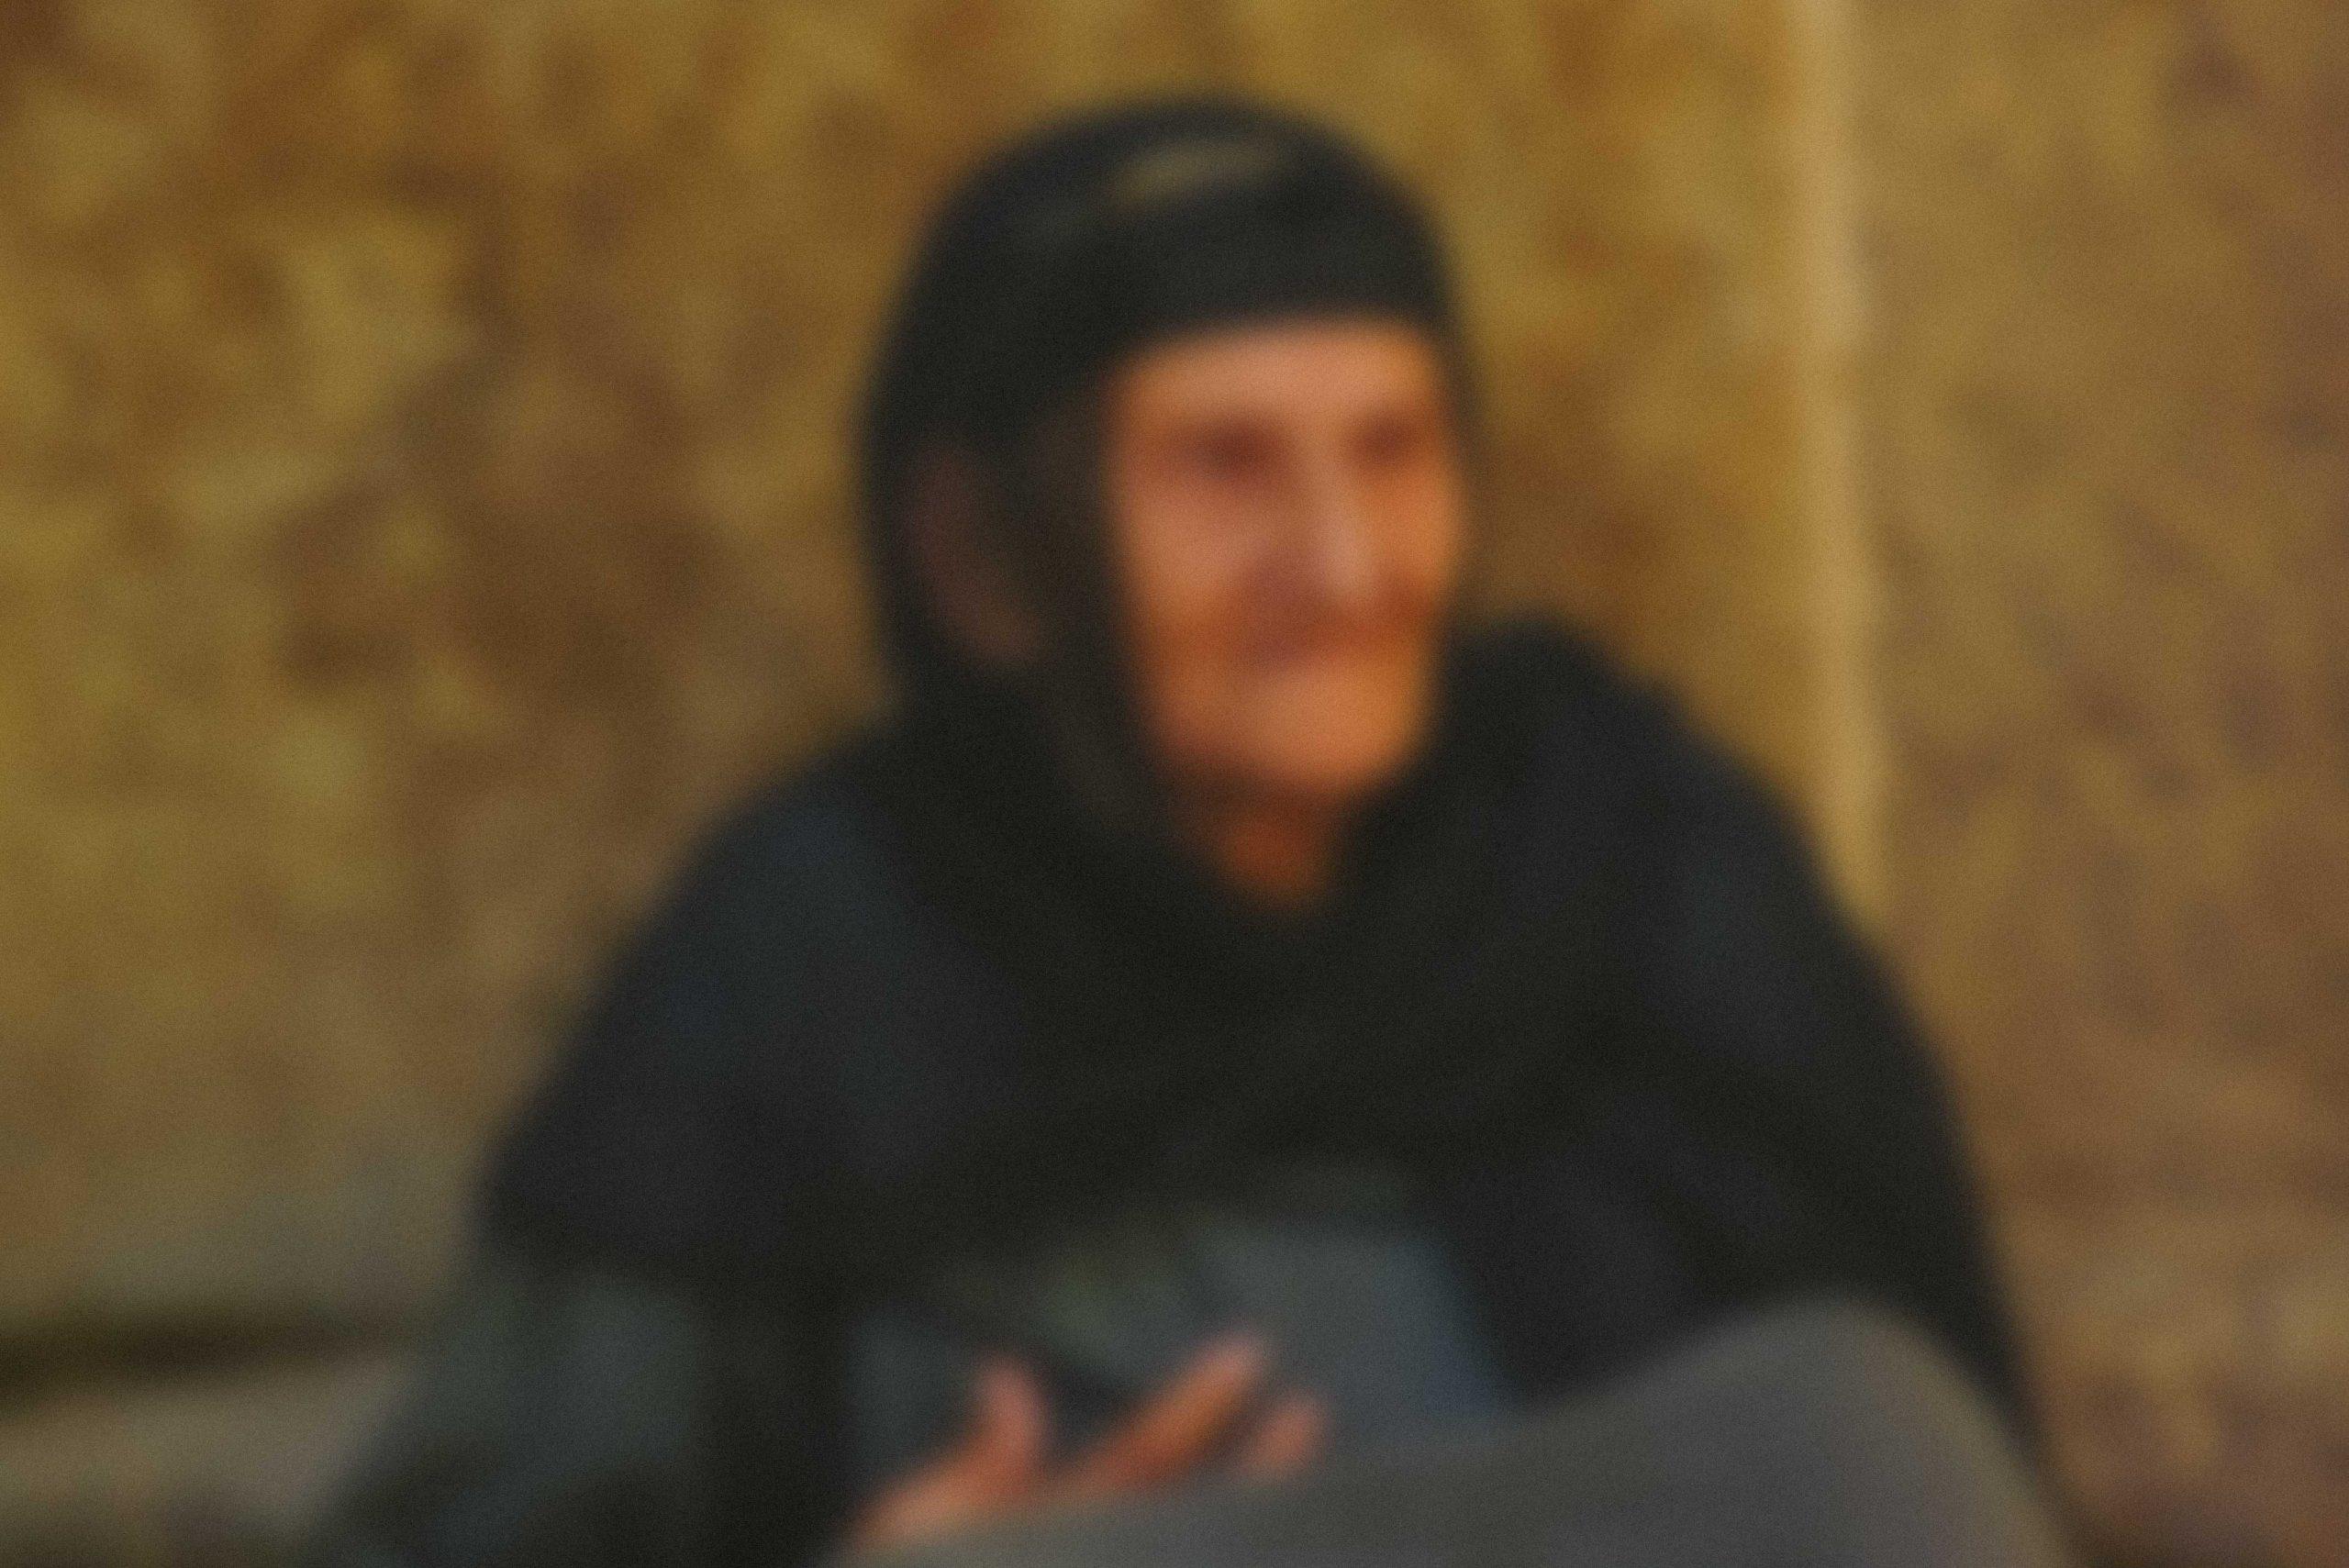 Dima Istambouli, Lebanon (Old Lady)